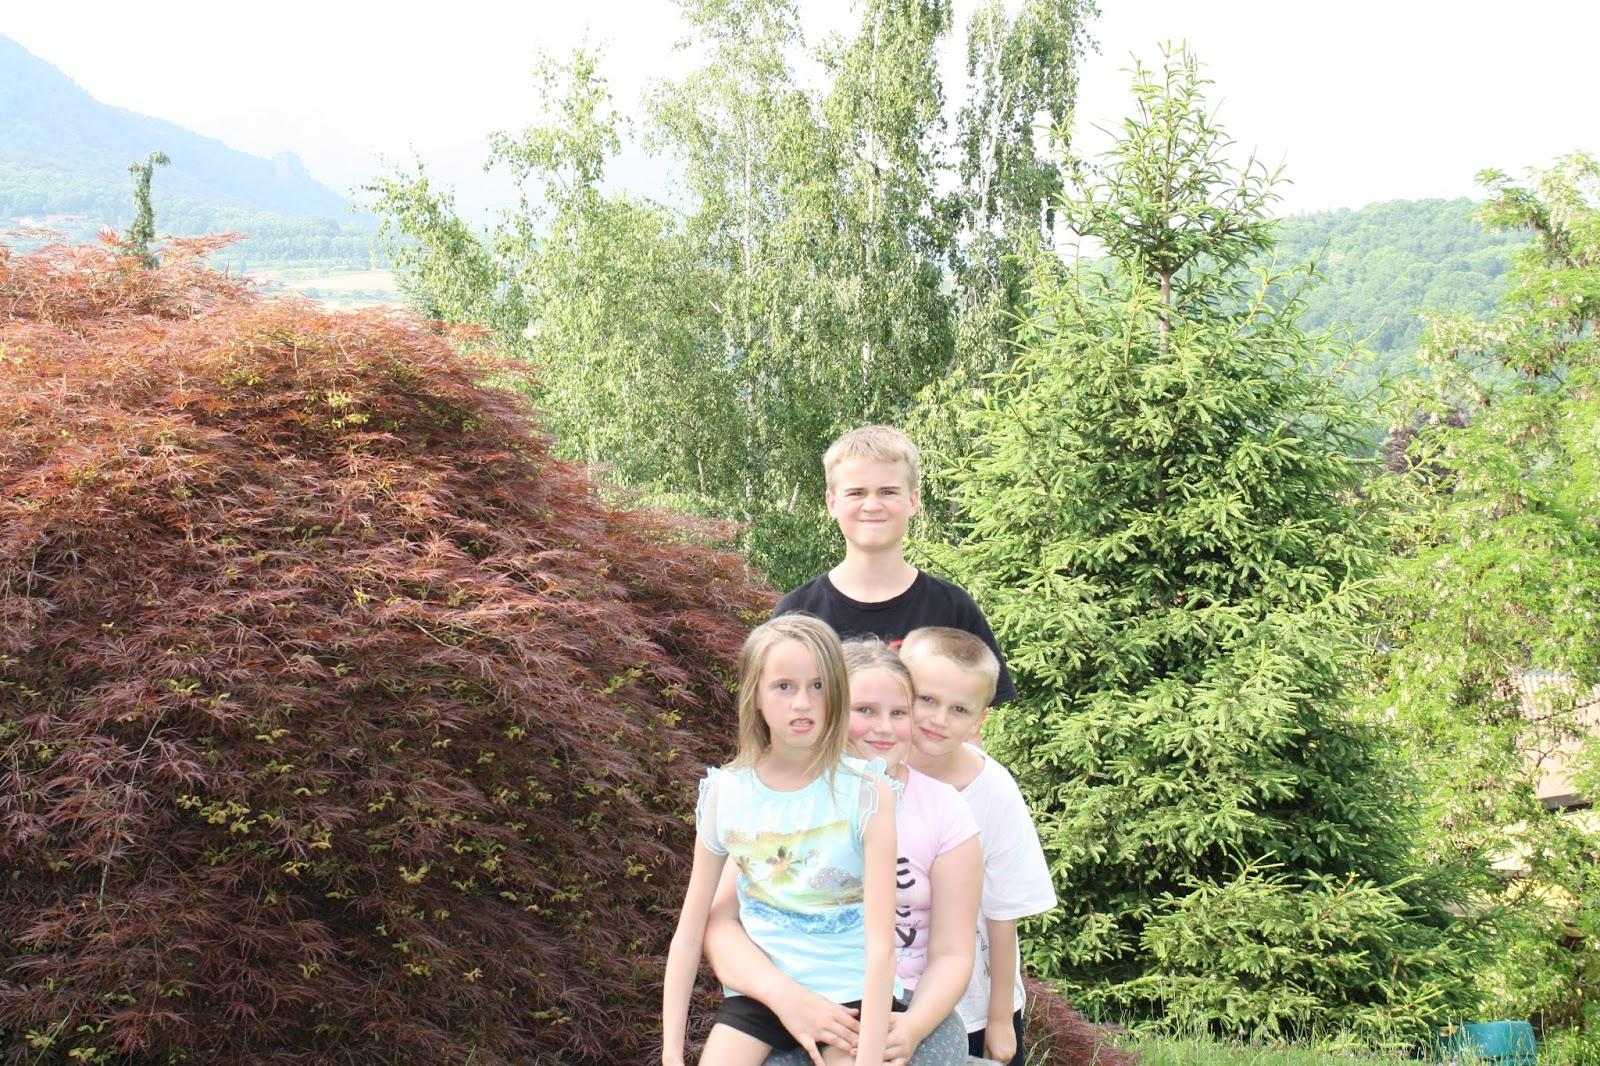 Homeschooling In The Nky June